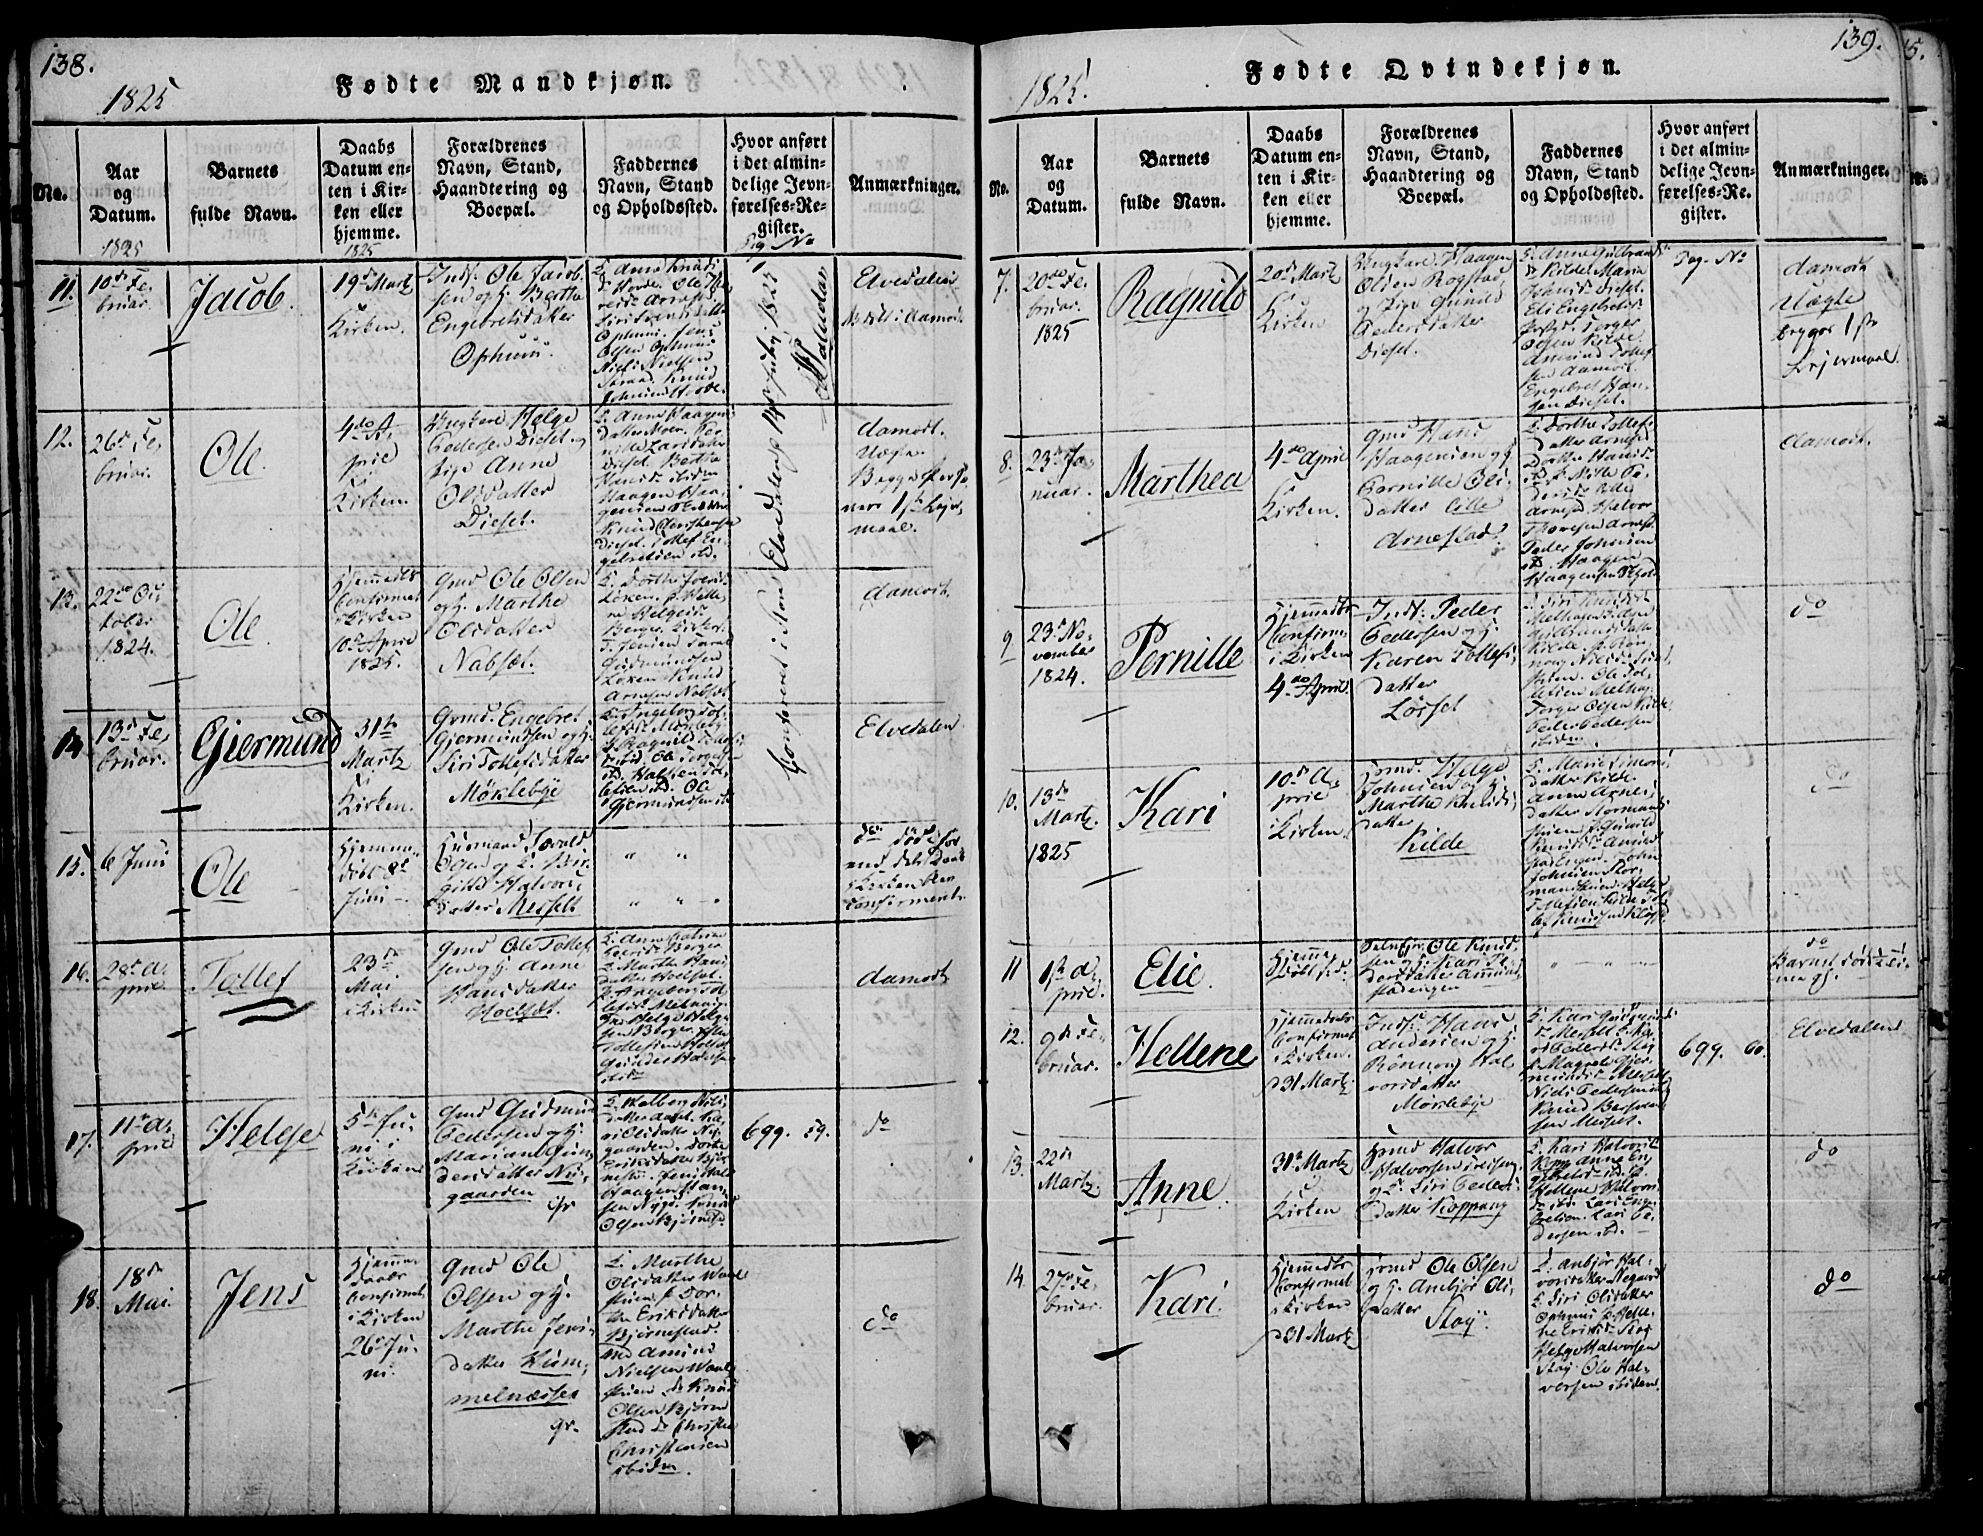 SAH, Åmot prestekontor, Ministerialbok nr. 5, 1815-1841, s. 138-139